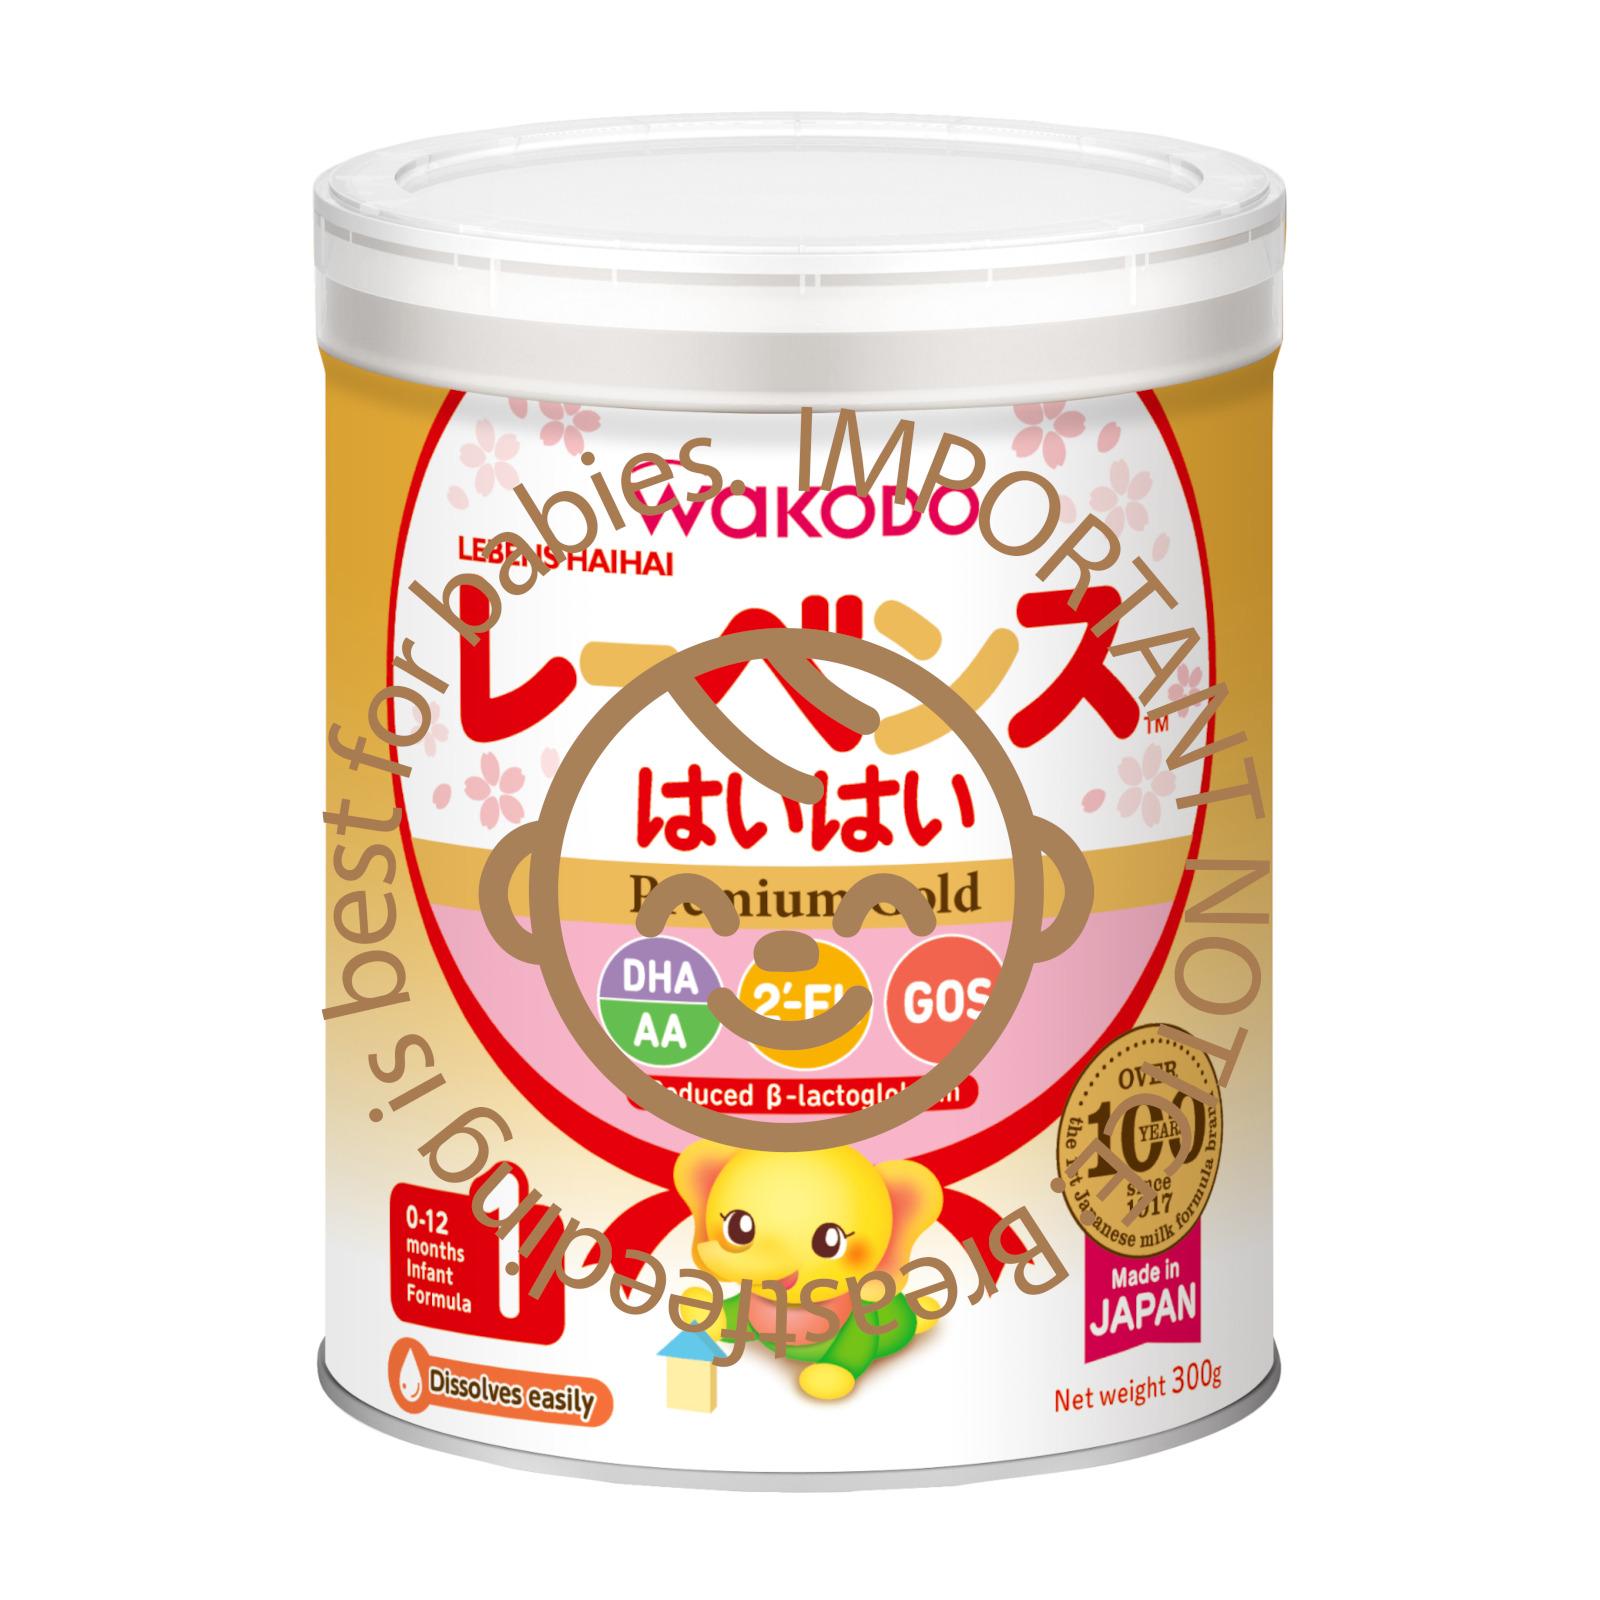 Wakodo Lebens 1 Premium Gold Infant Formula Stage 1 (0-12mth)